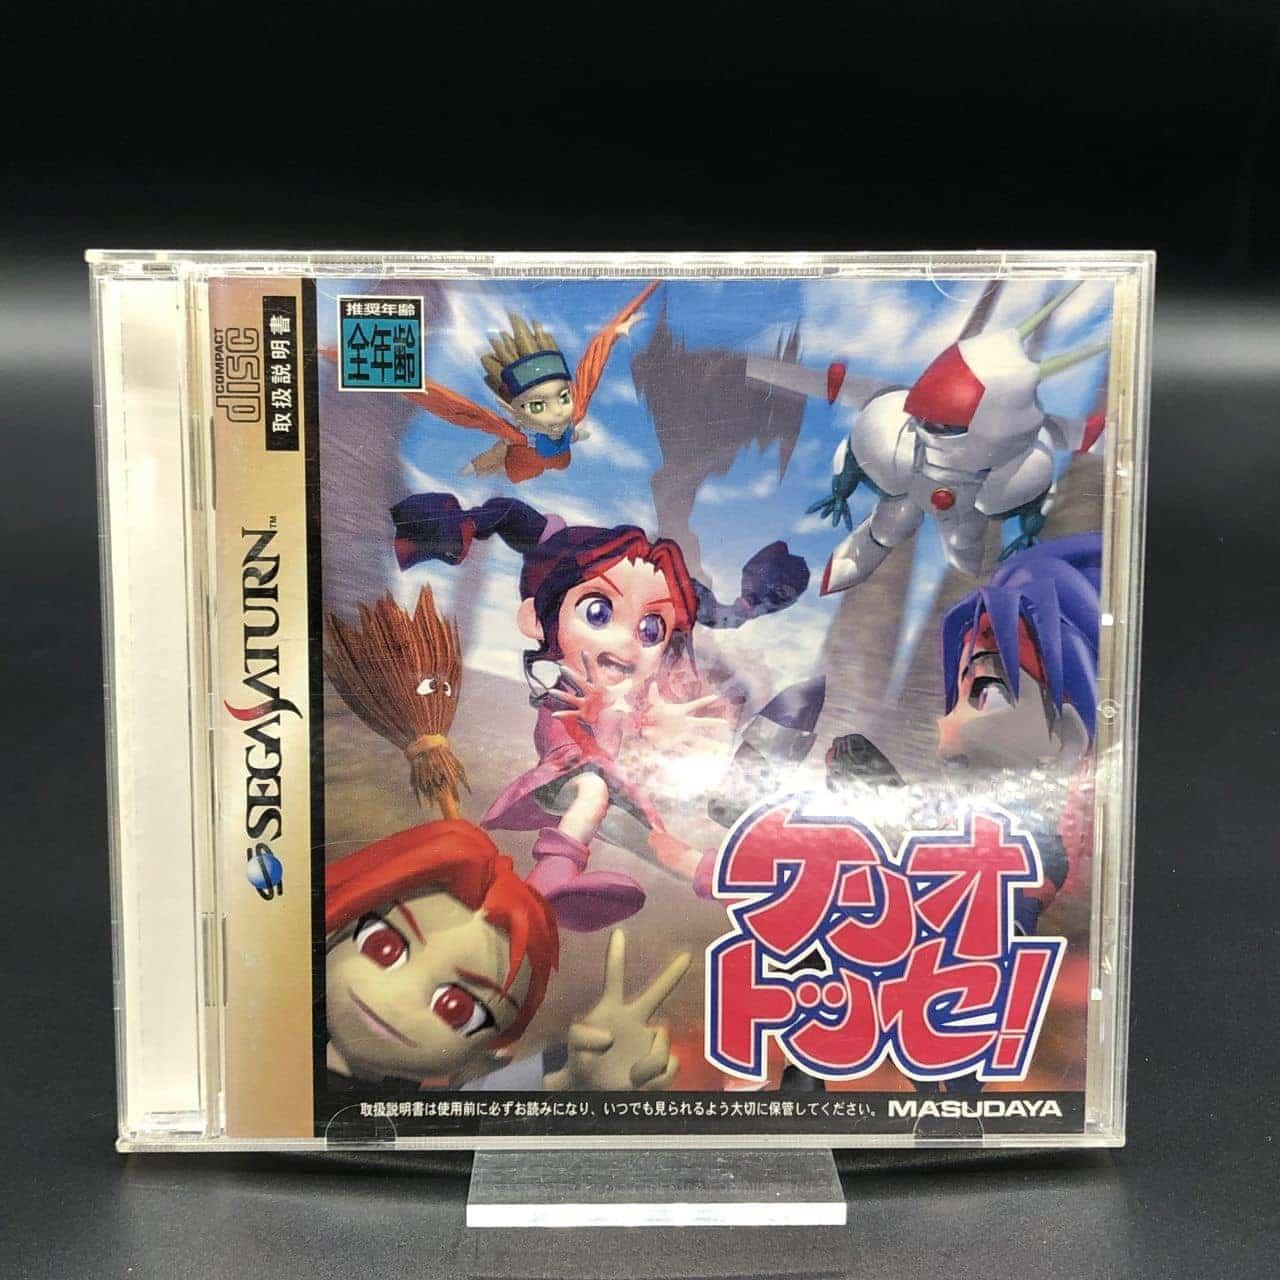 Keriotosse (Import Japan) (Komplett) (Sehr gut) Sega Saturn